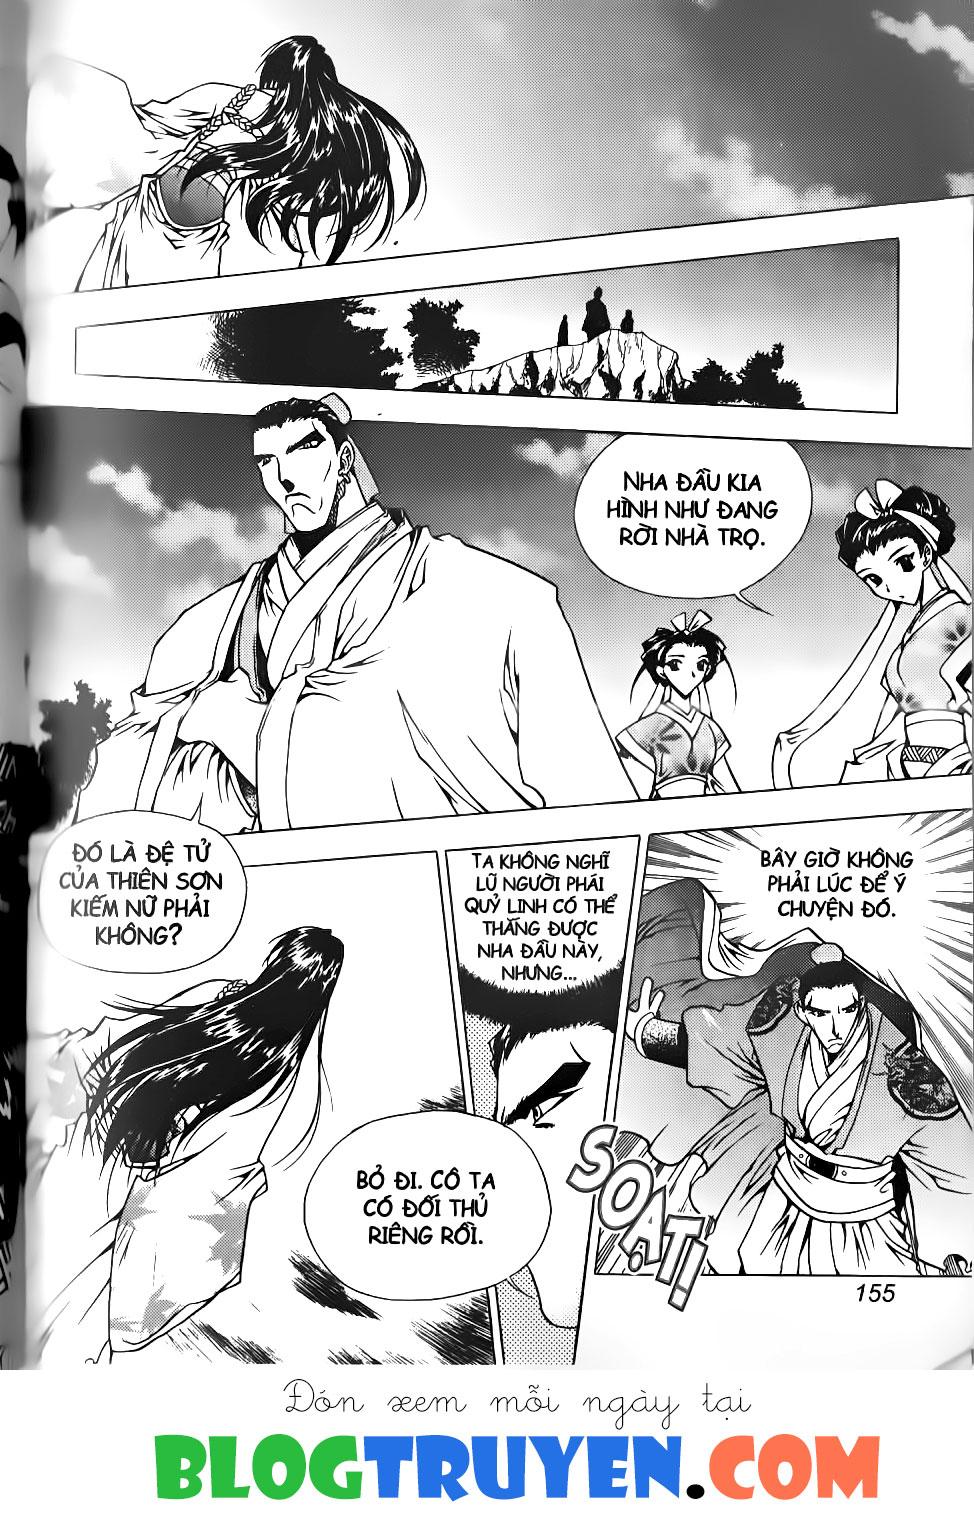 Thiên Lang Liệt Truyện Scan Chap 60 - Truyen.Chap.VN